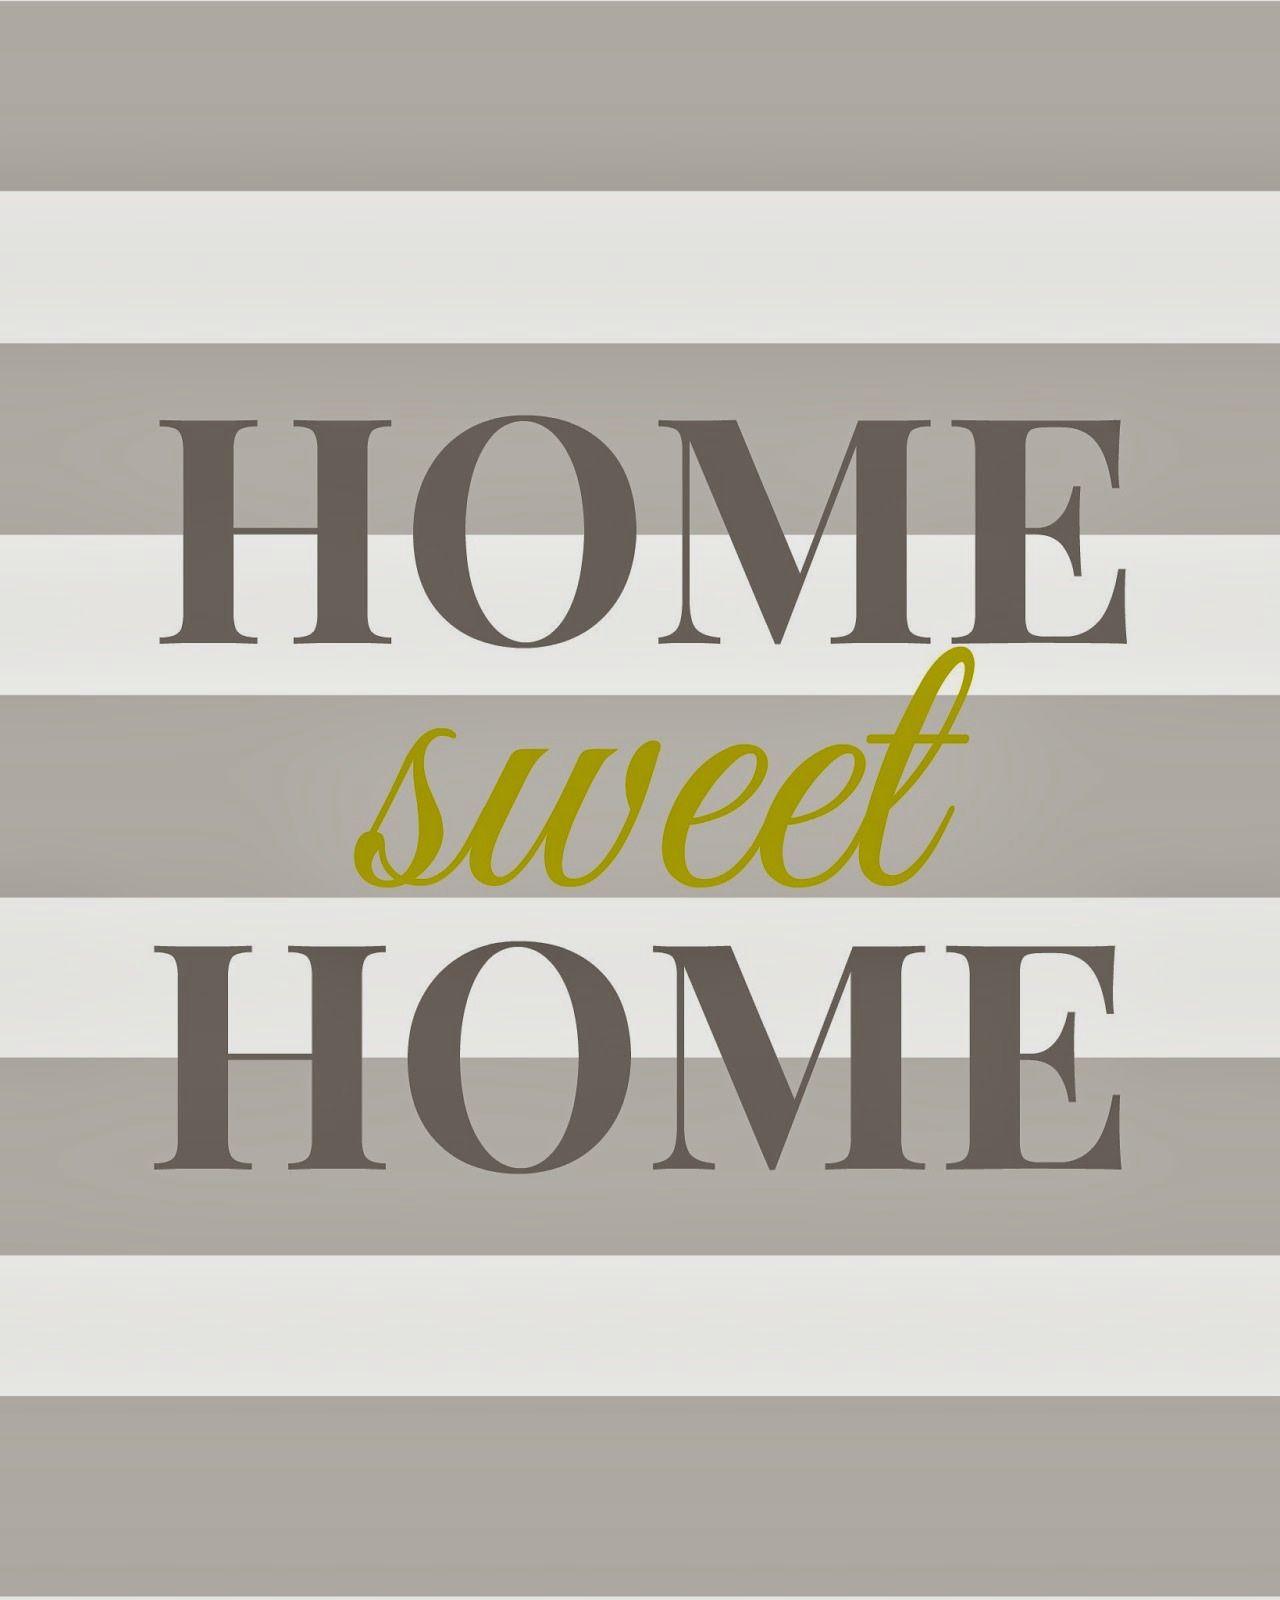 Home Sweet Home - Free Printable | Idées Pour La Maison | Plotten - Home Sweet Home Free Printable